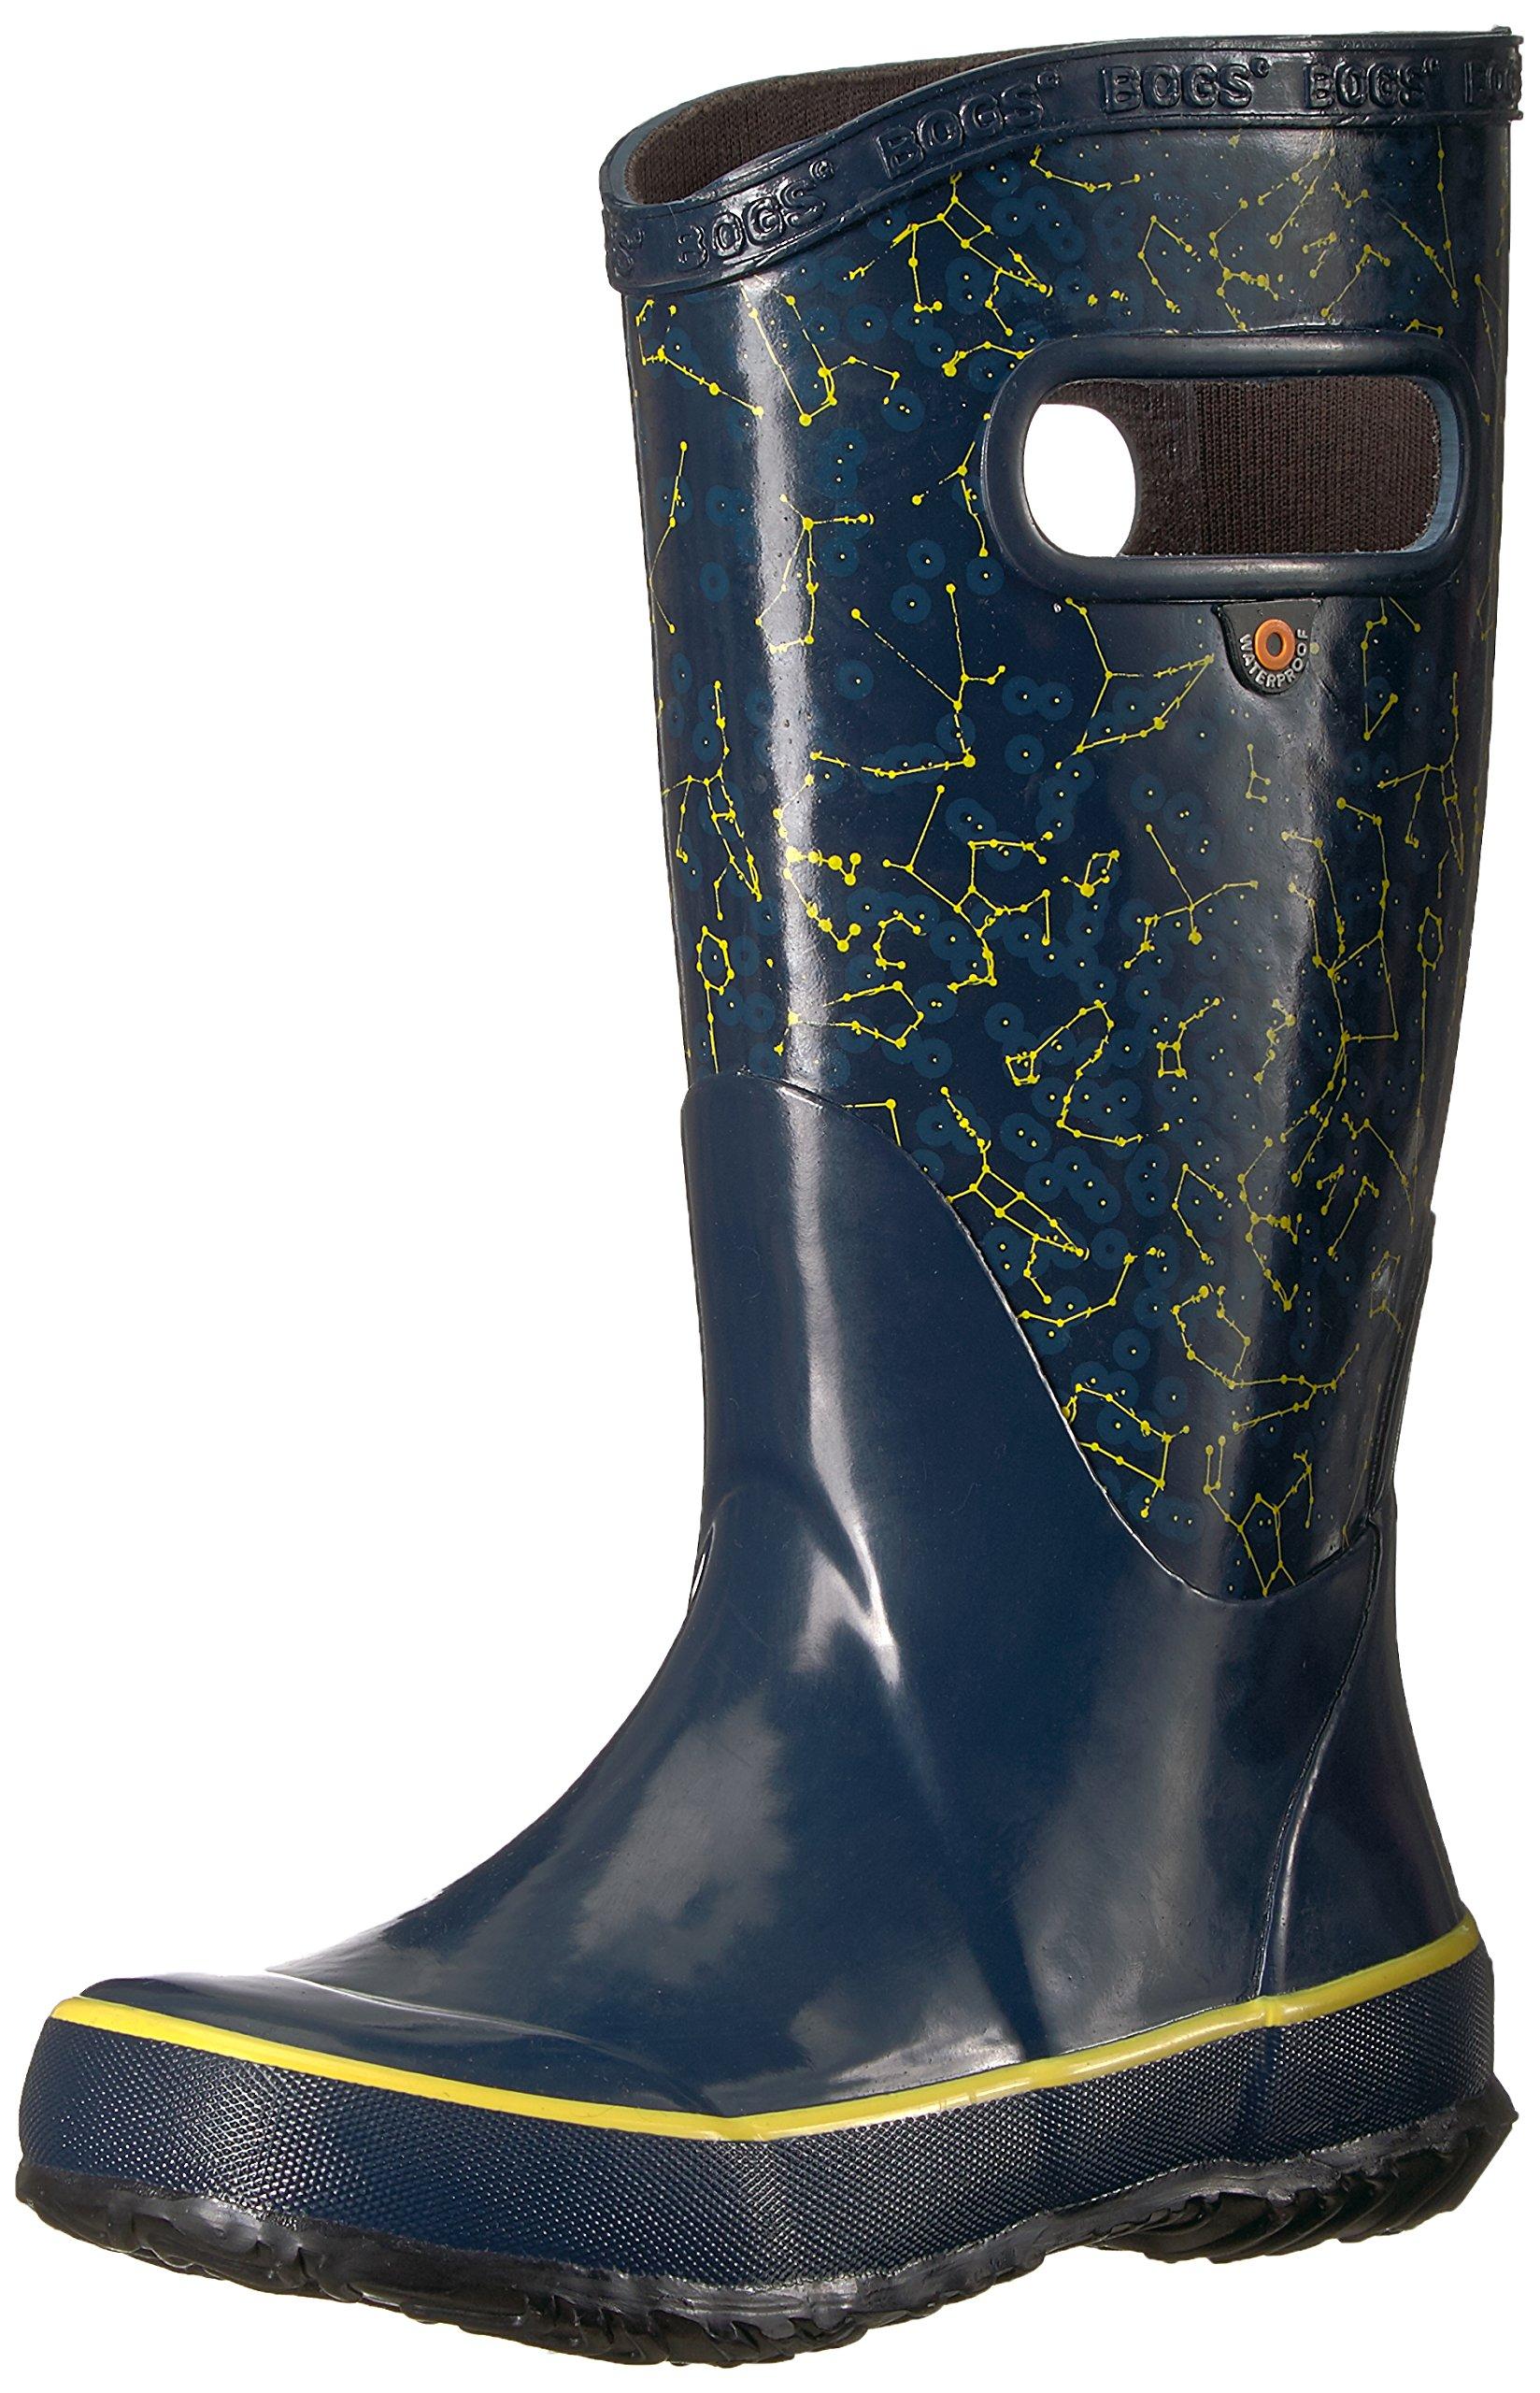 Bogs Kids Rubber Waterproof Rain Boot for Boys and Girls, Constellations Print/Dark Blue/Multi, 9 M US Toddler